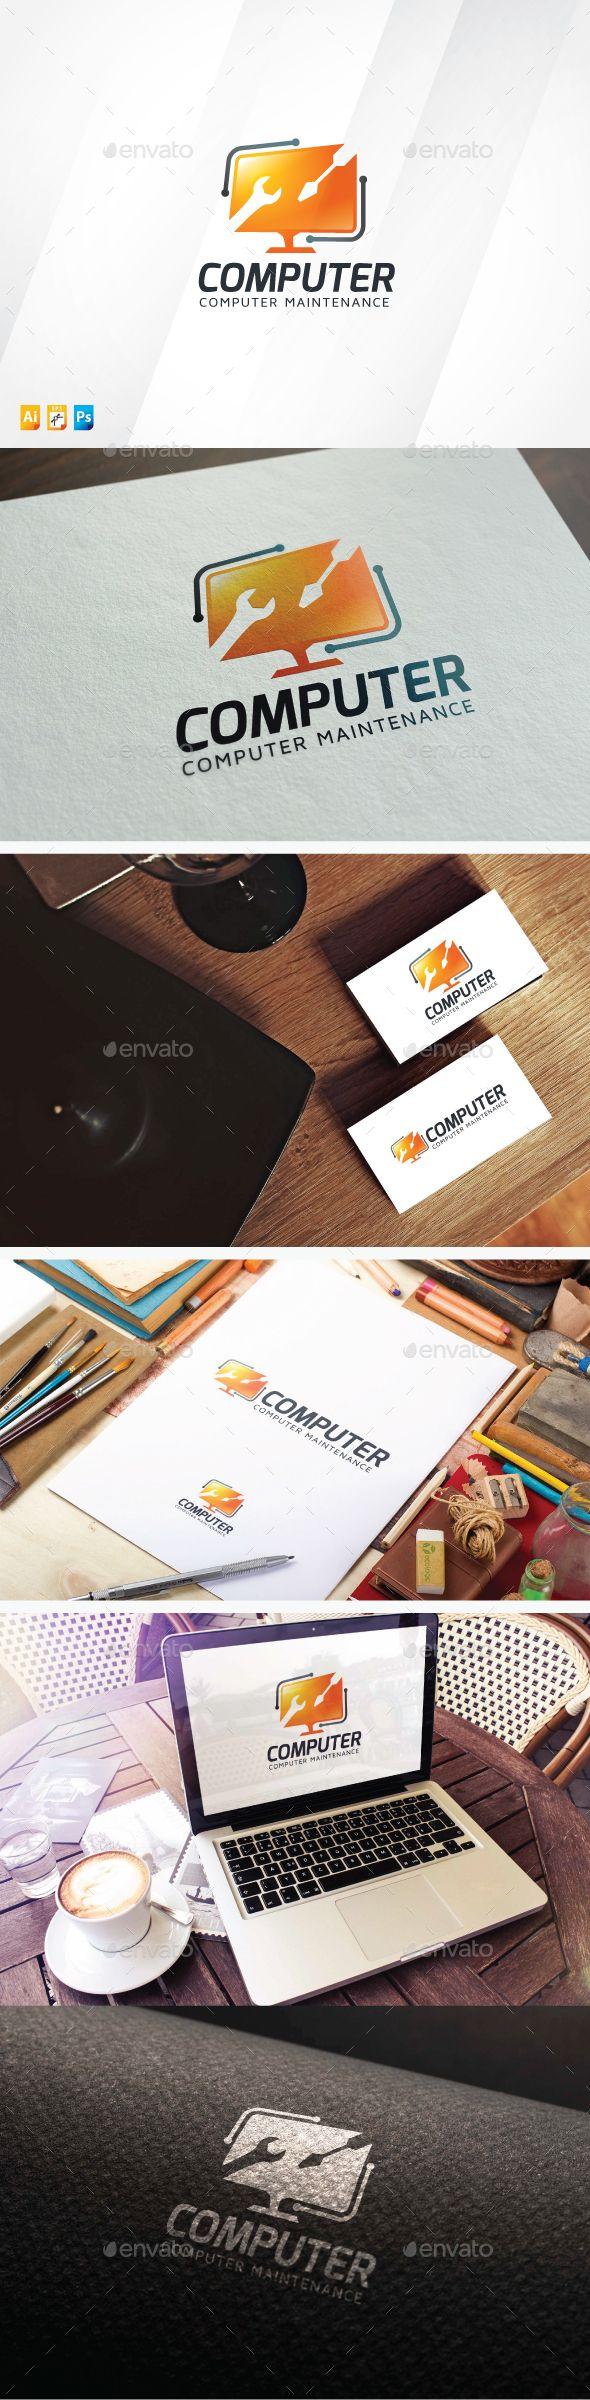 242 best logos branding images on pinterest draw business computer maintenance logo magicingreecefo Images